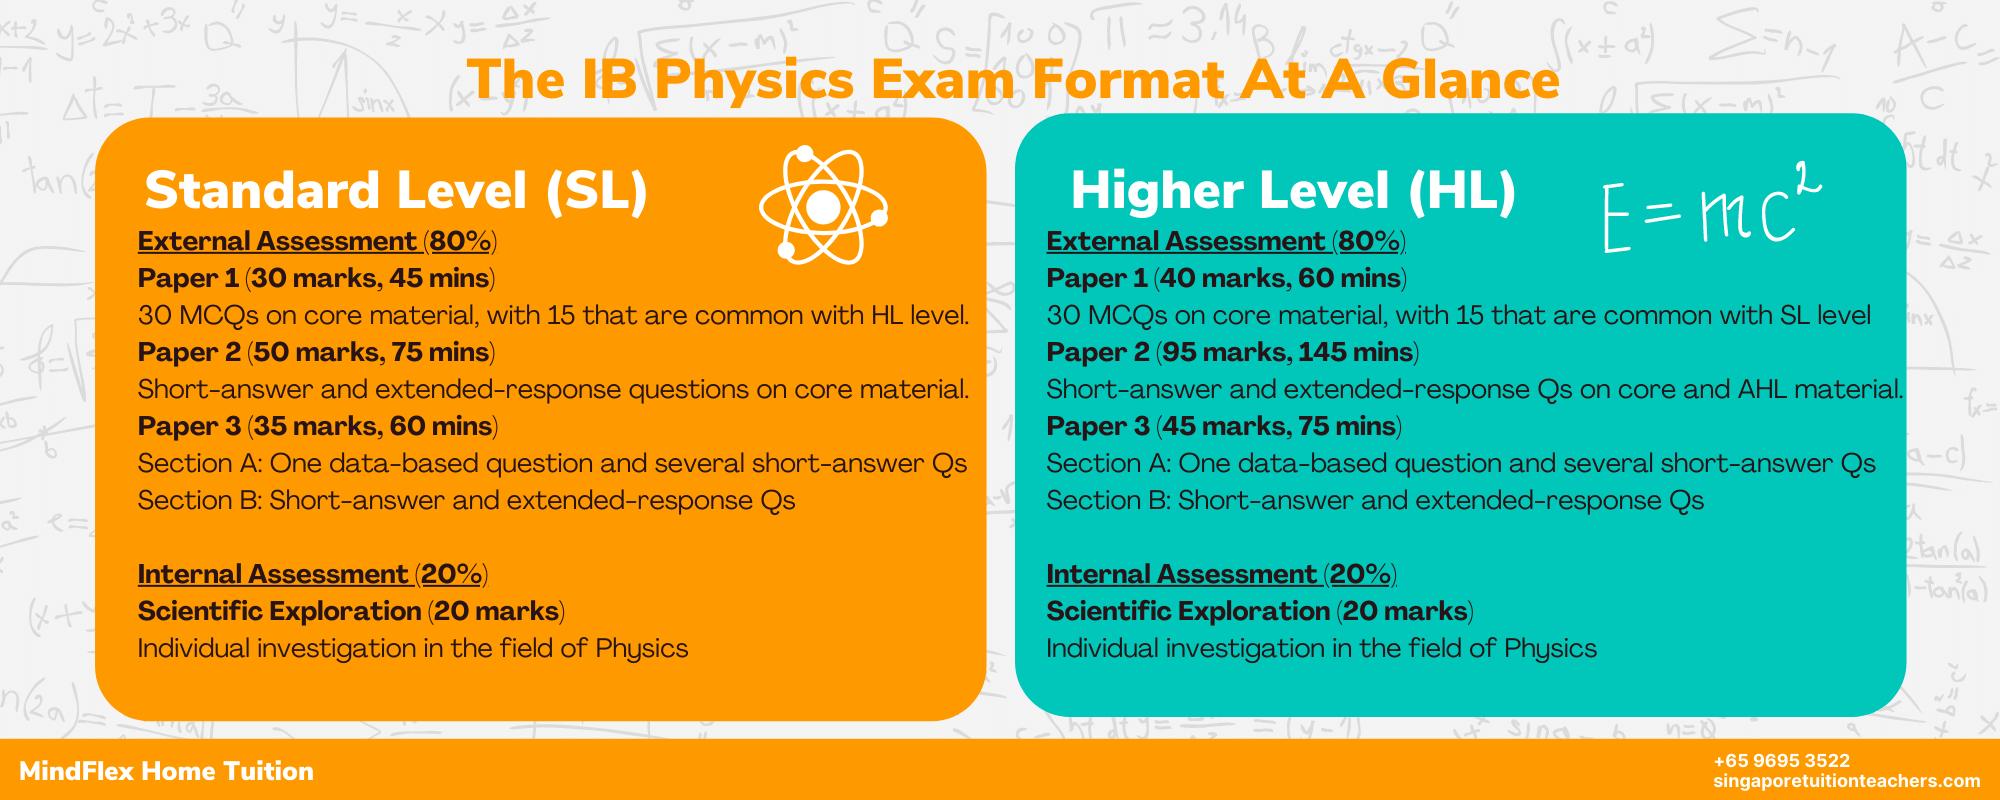 IB Physics (SL/HL) Examination Format